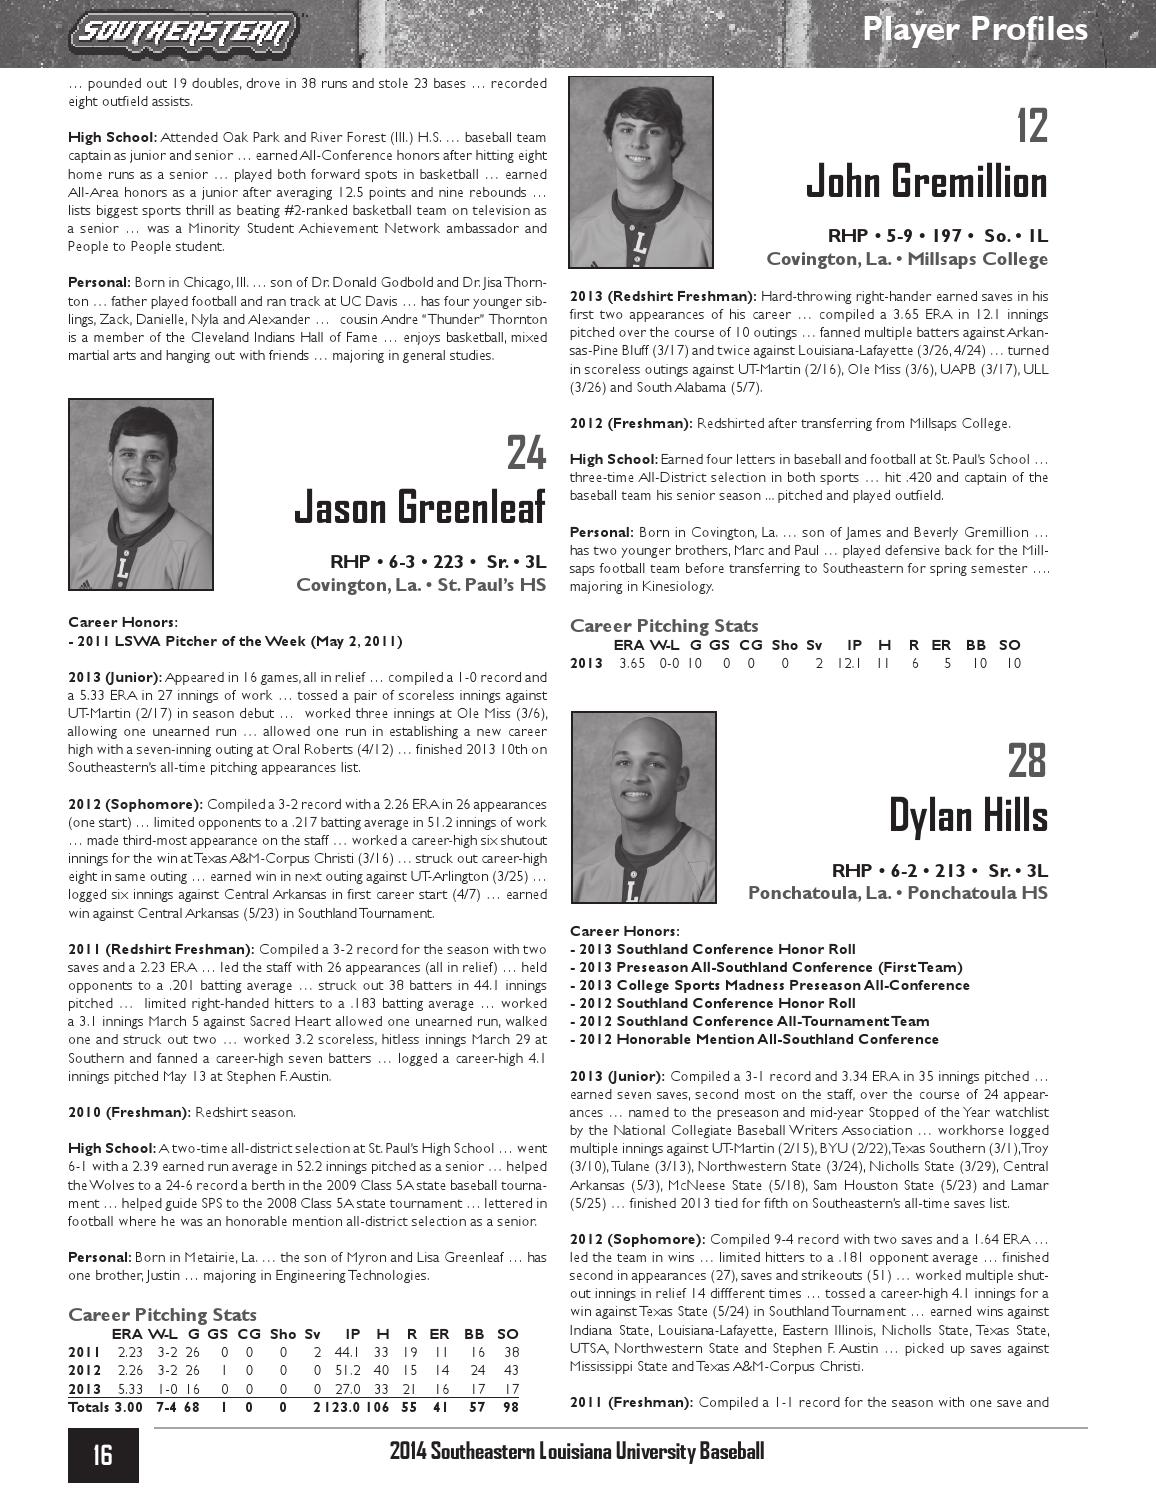 2014 Southeastern Louisiana Baseball Media Guide by